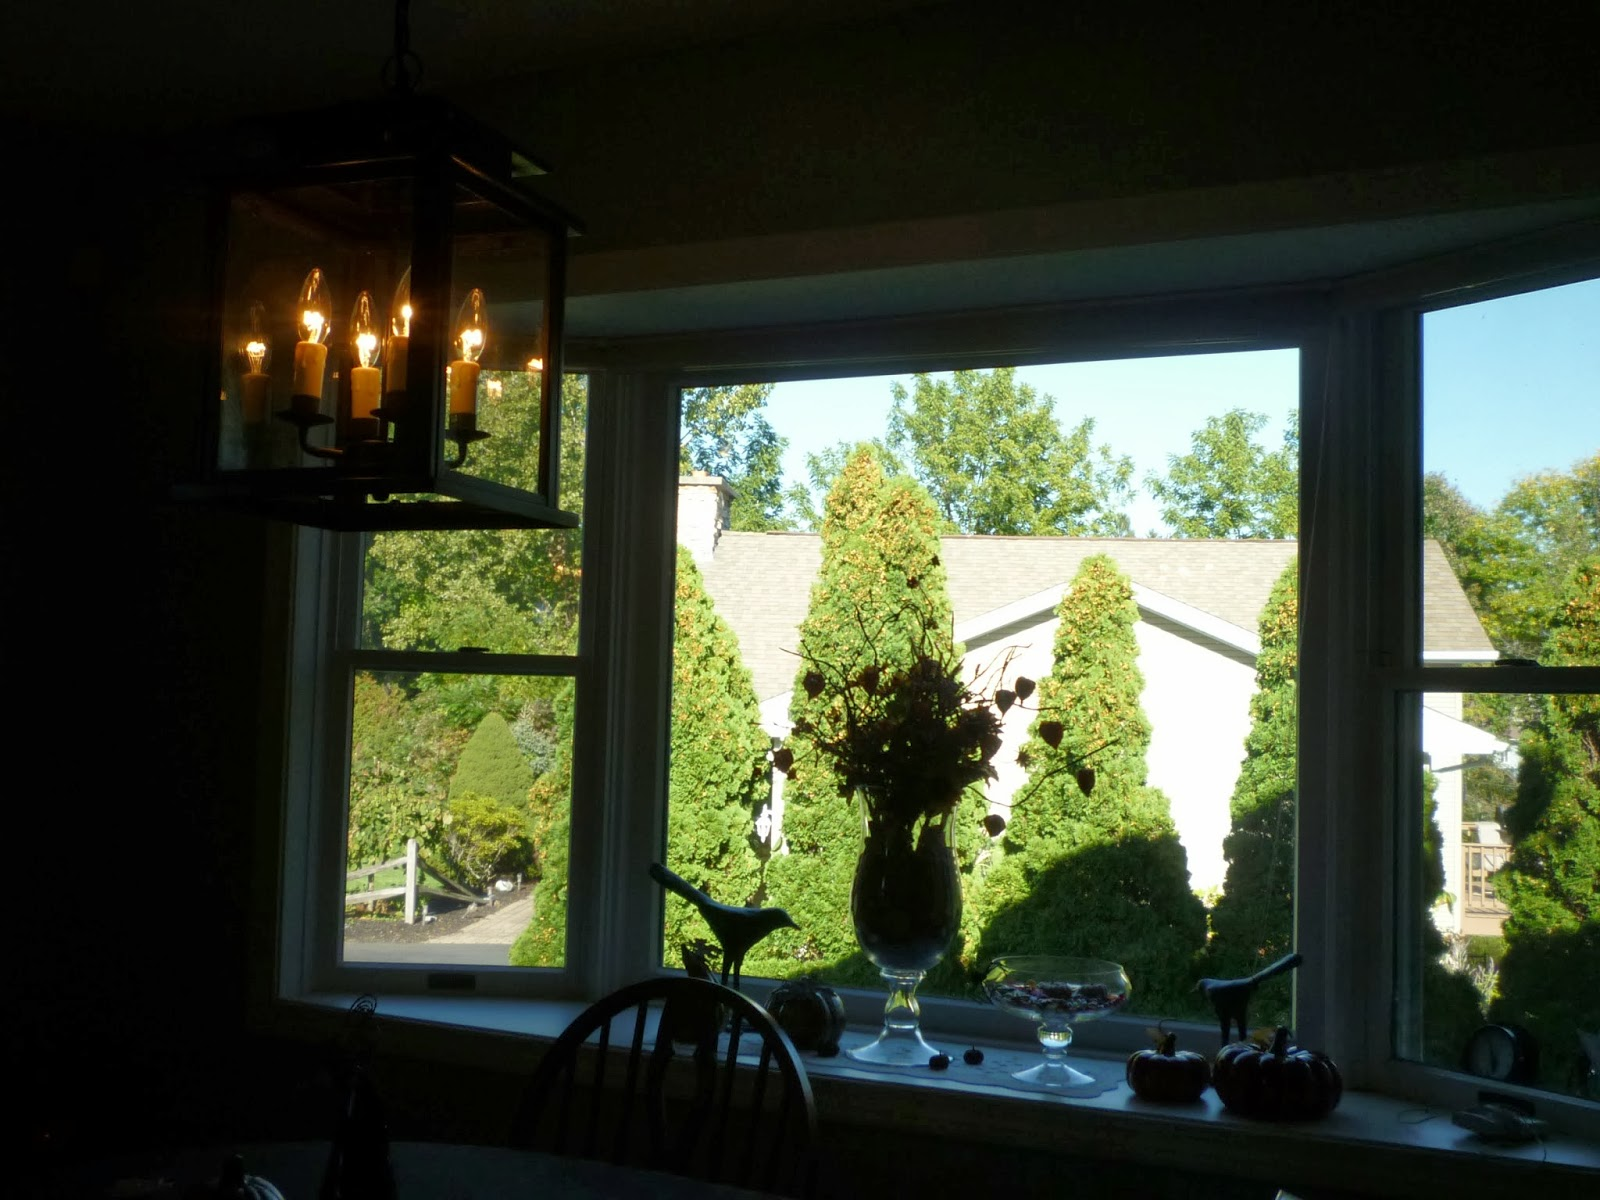 River sister ballard light fixture finished fall window - Window decorations for fall ...